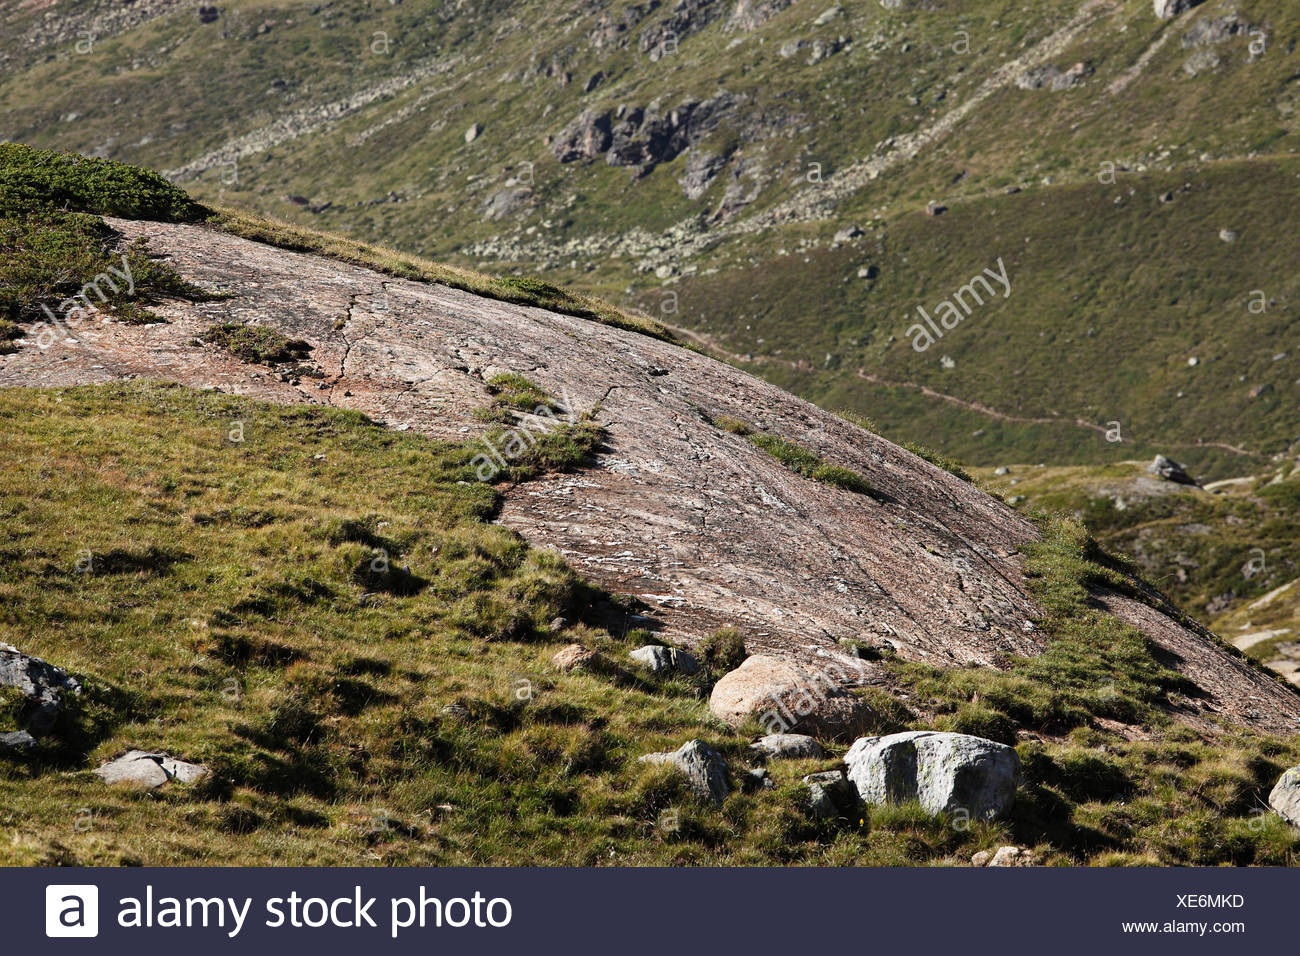 Glacier-polished rock, Kaunertal, Oetztal Alps, Tyrol, Austria, Europe - Stock Image